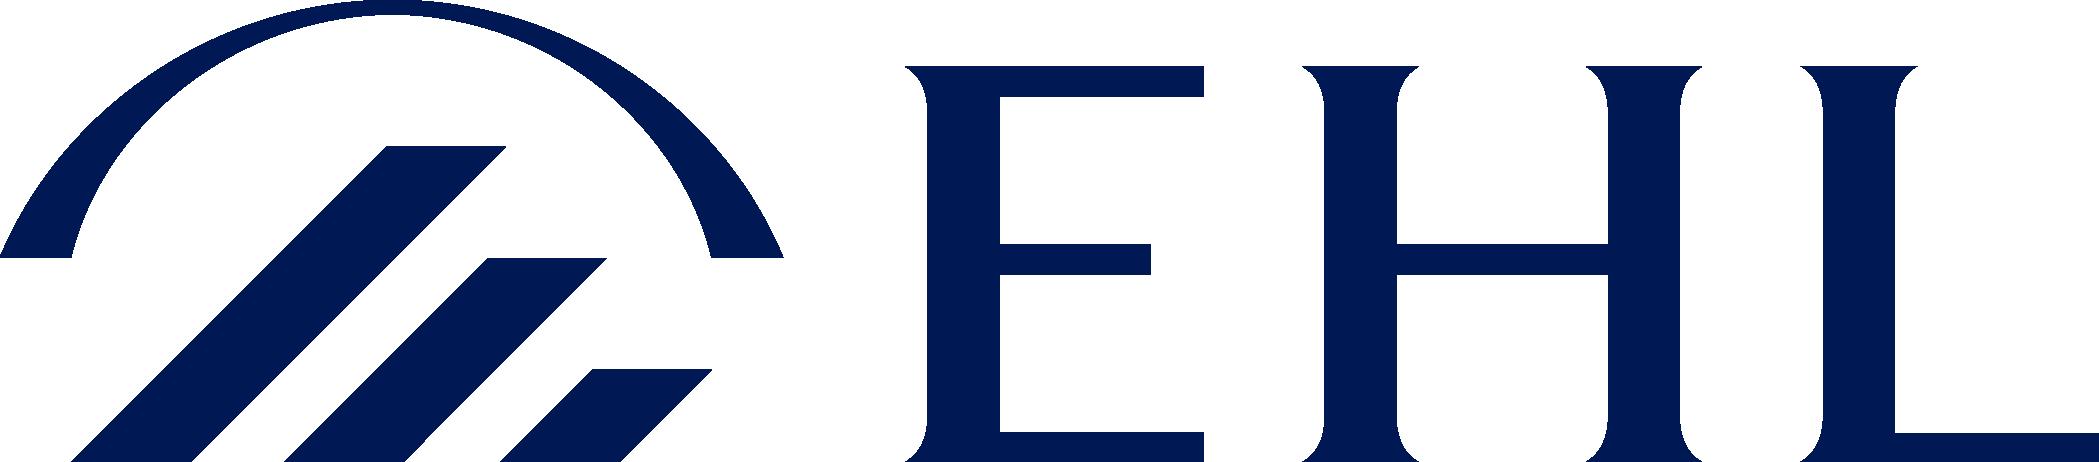 EHL2021泛酒店业创新挑战赛 - 中国站报名页面